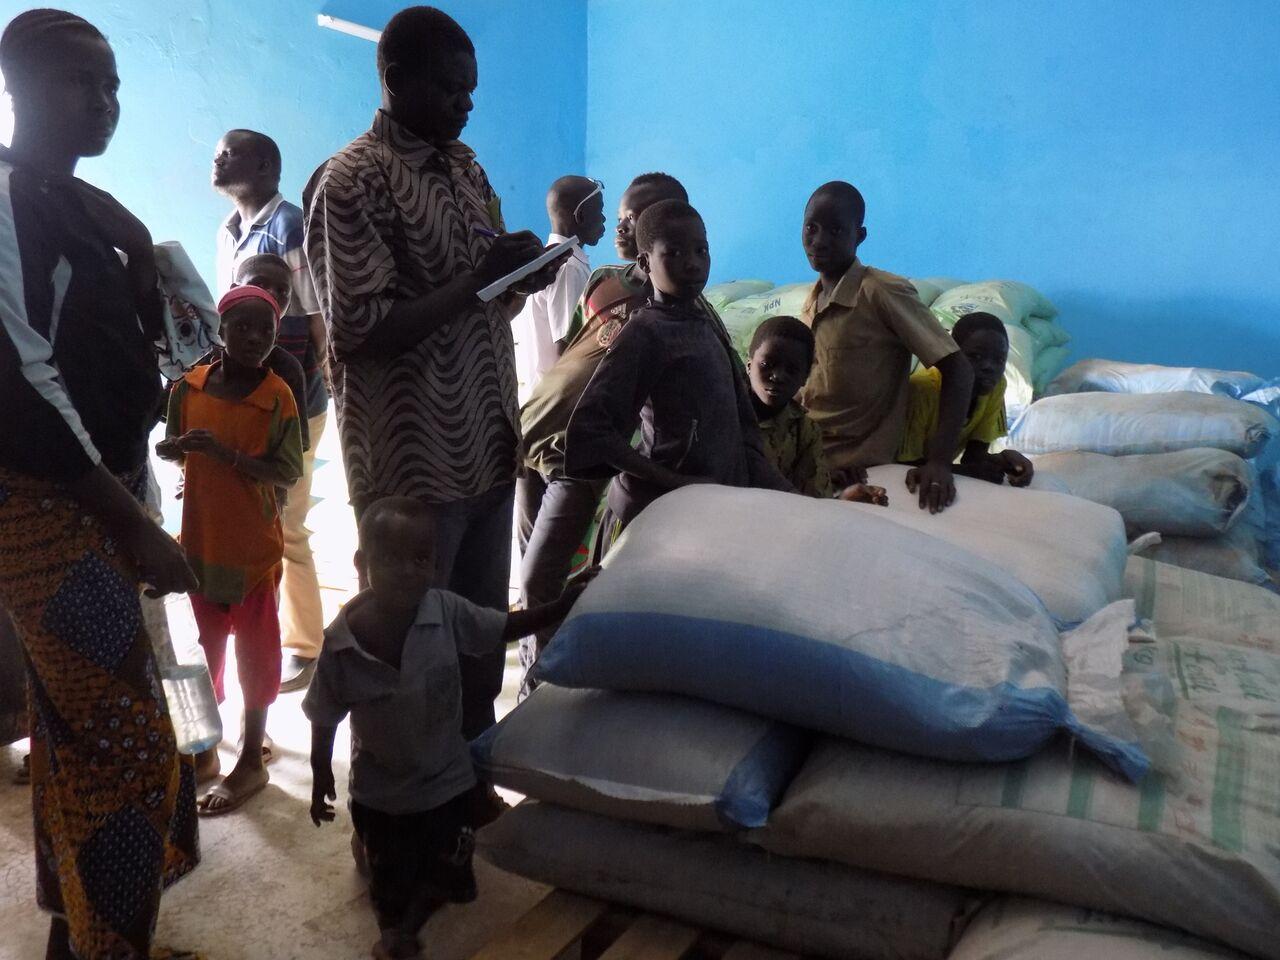 Centro_Agricolo3_Burkina_Faso_Mani_Tese_2017